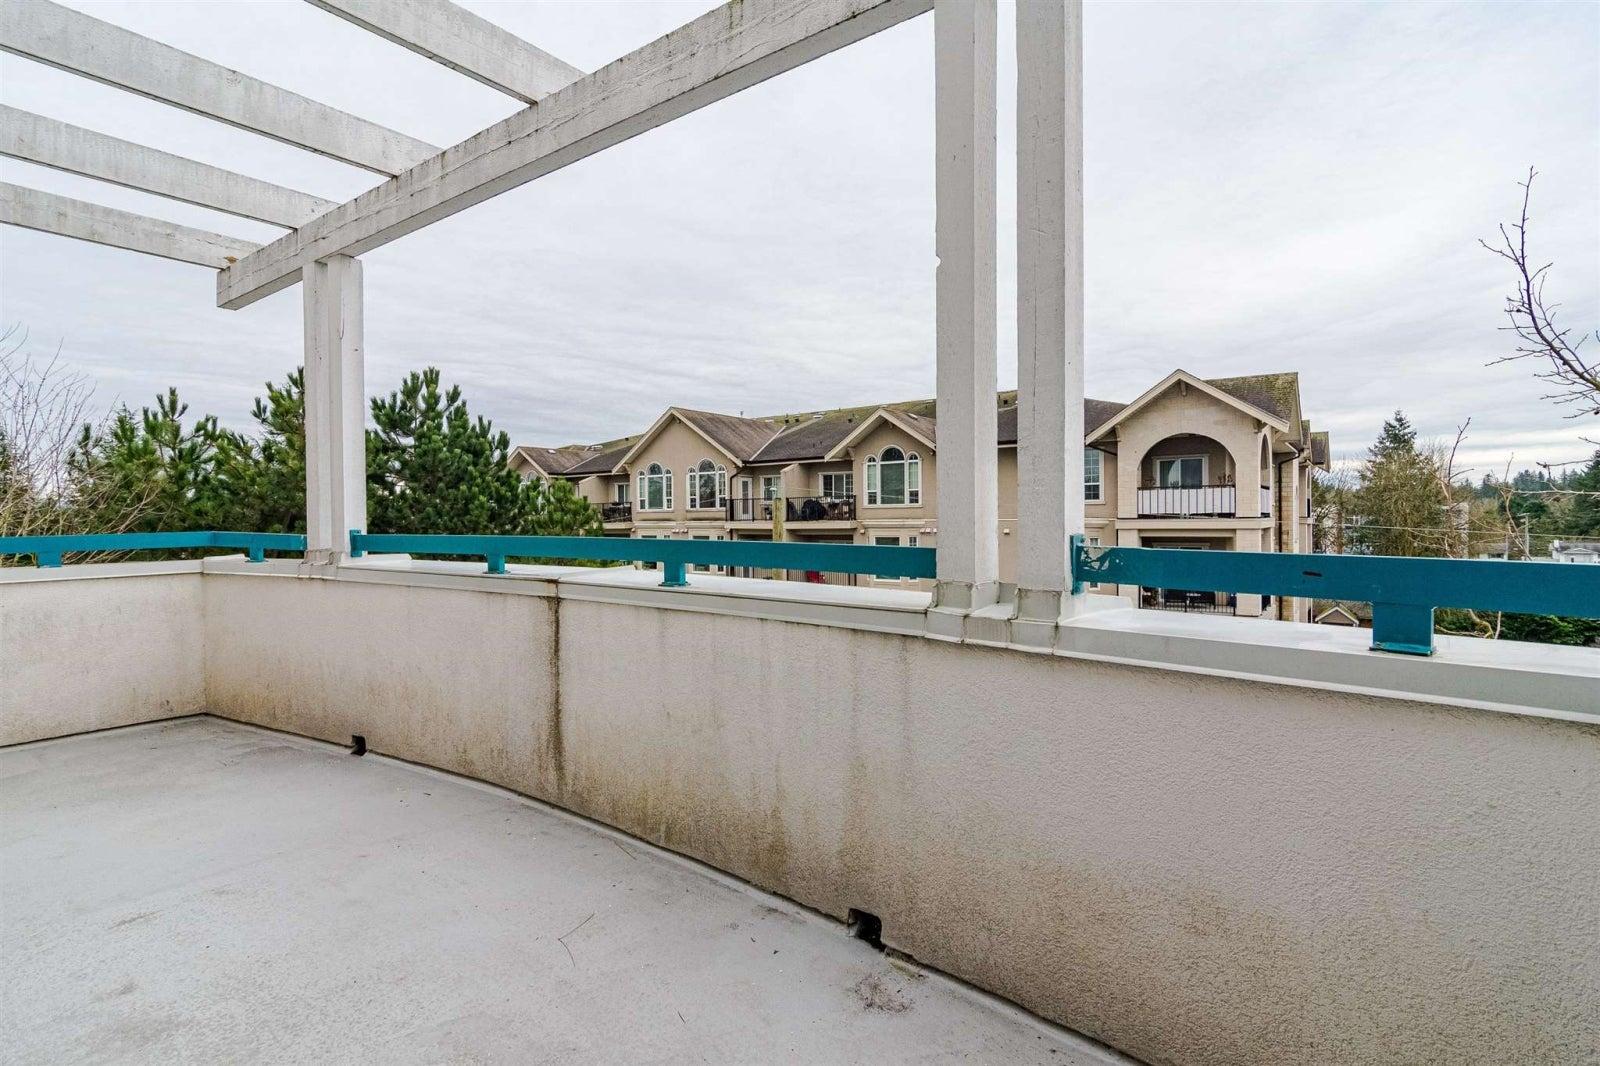 405 20268 54 AVENUE - Langley City Apartment/Condo for sale, 2 Bedrooms (R2604183) #20